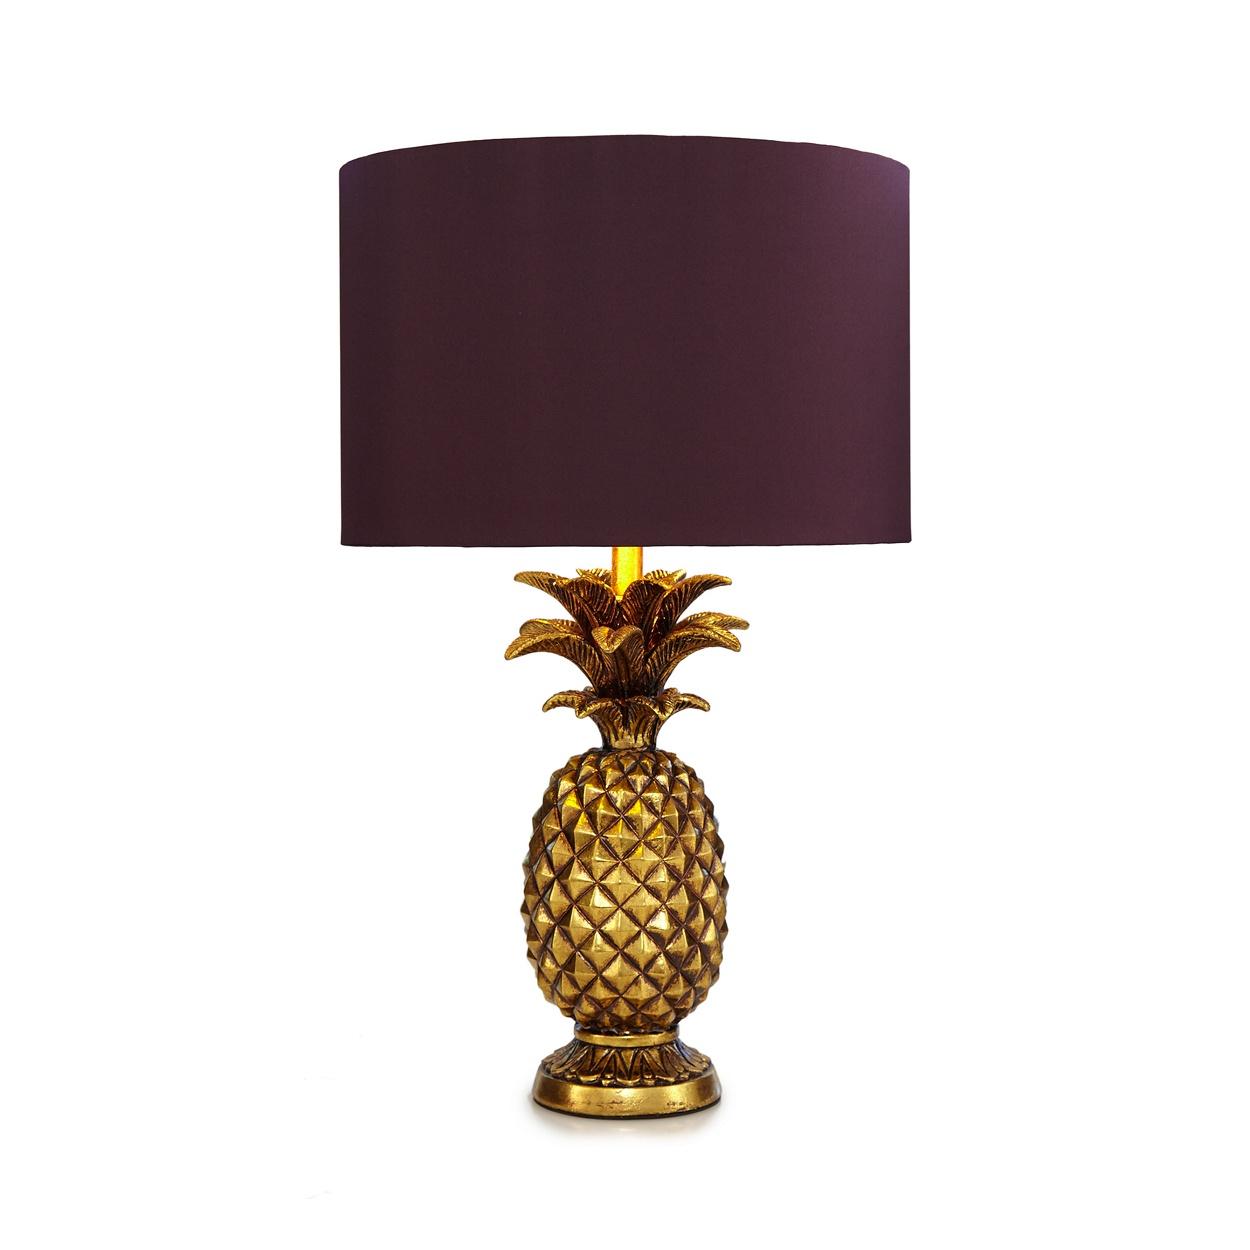 Tall Bedroom Lamps Table Lamps Debenhams